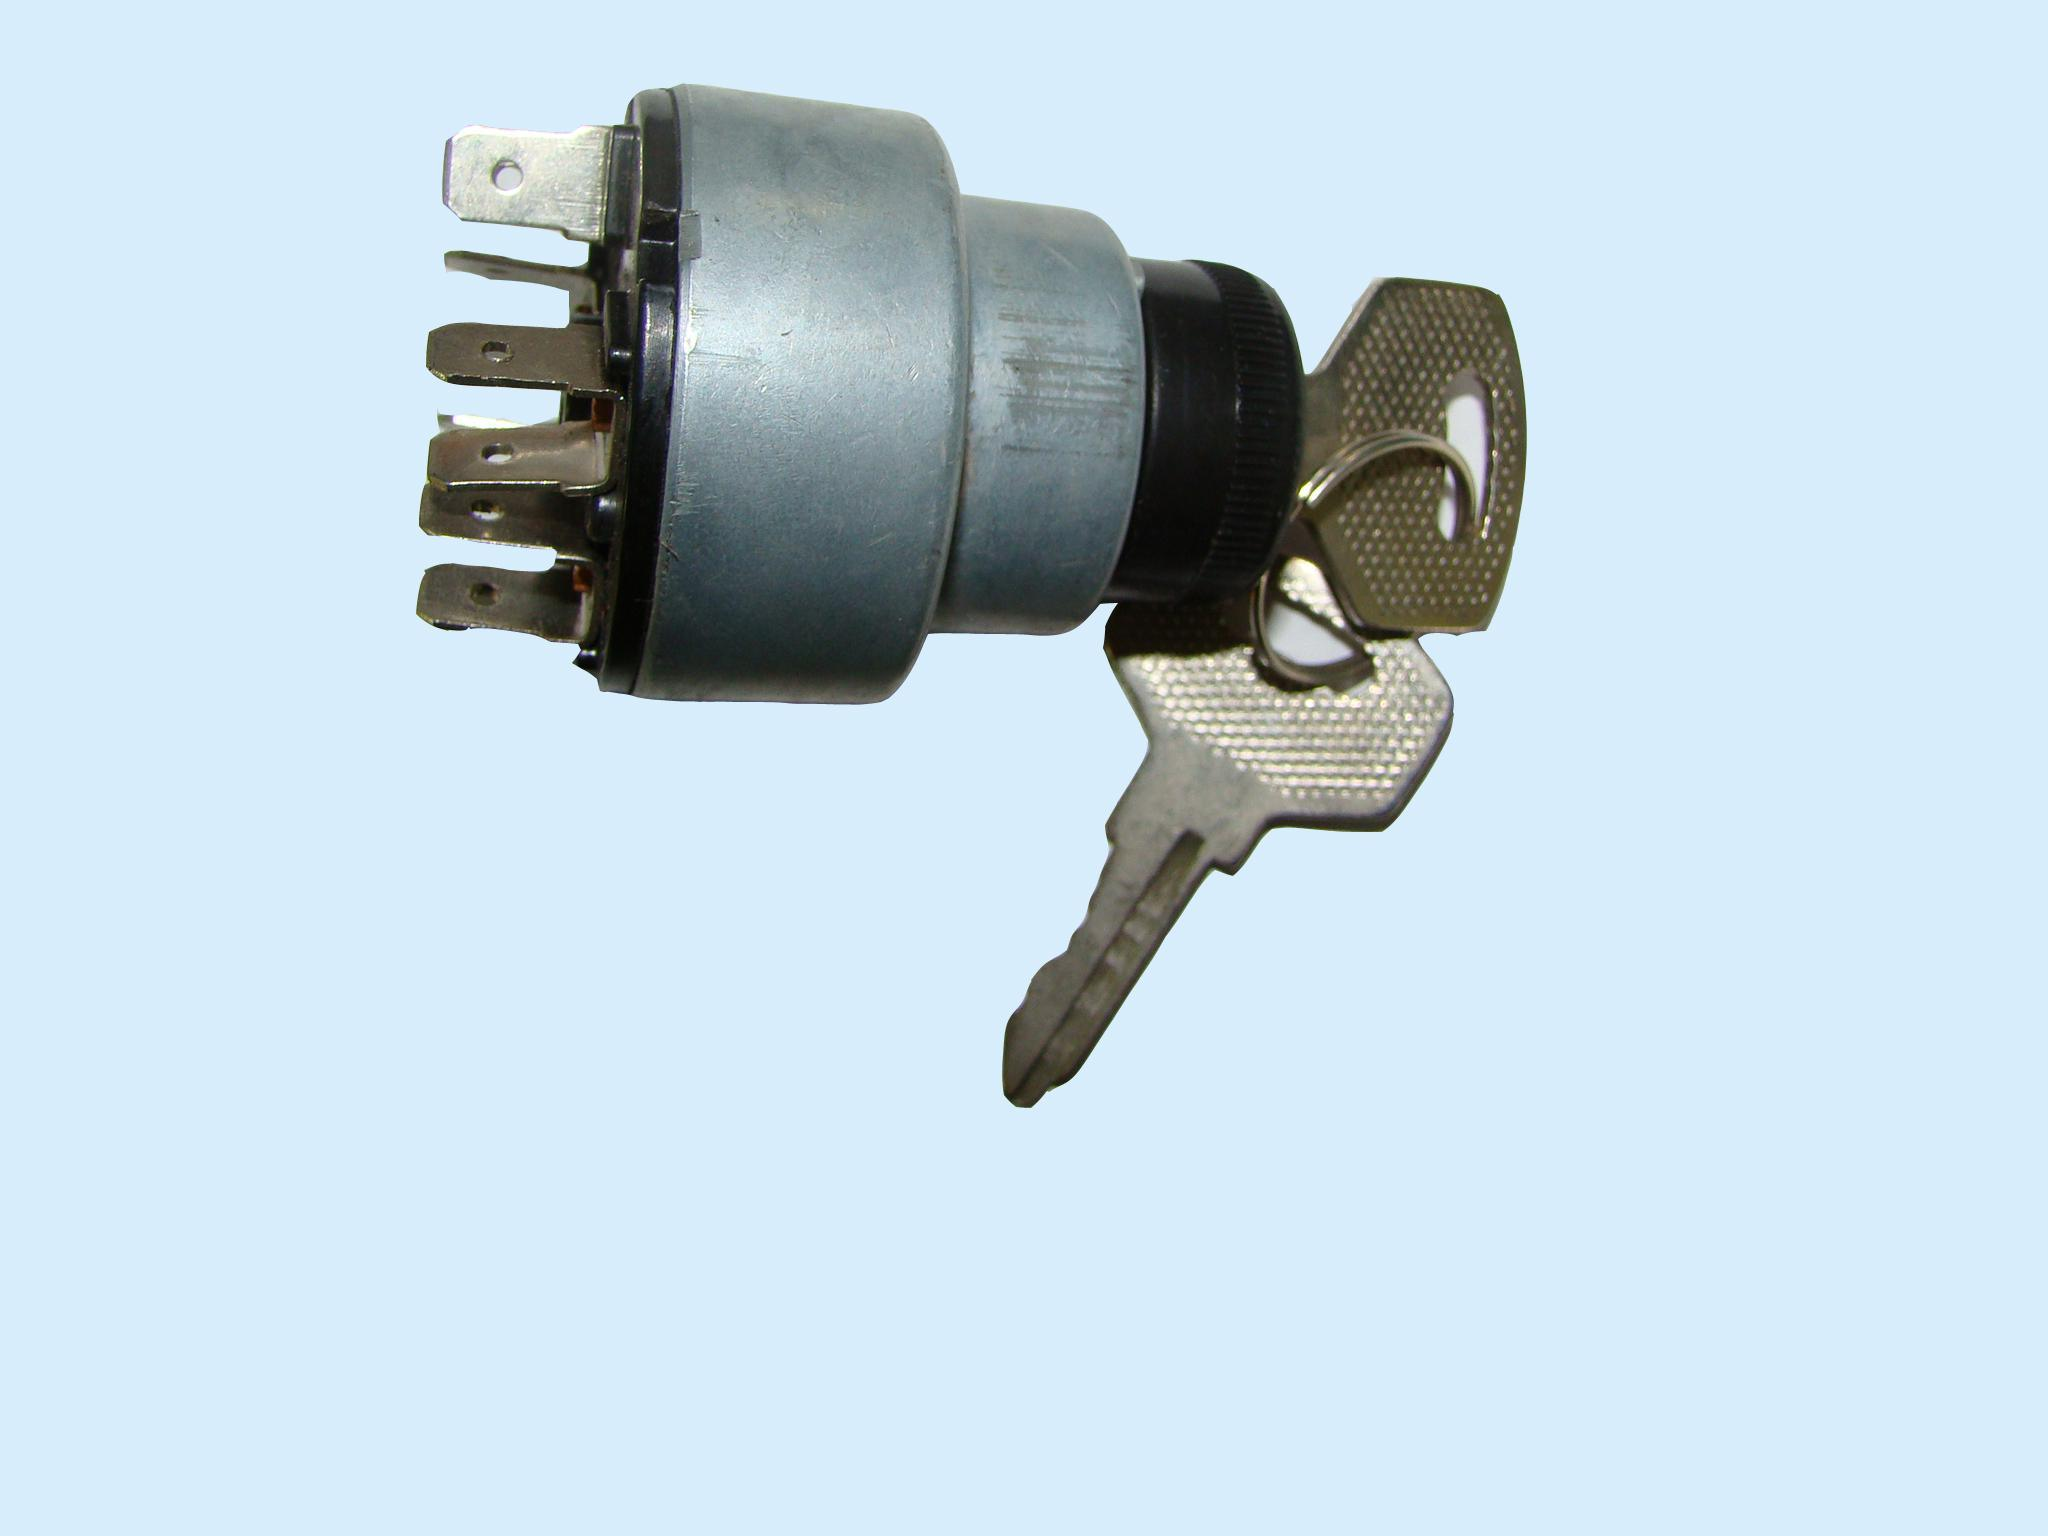 Universal Ignition Switch Universal Ignition Switch Wiring Ignition